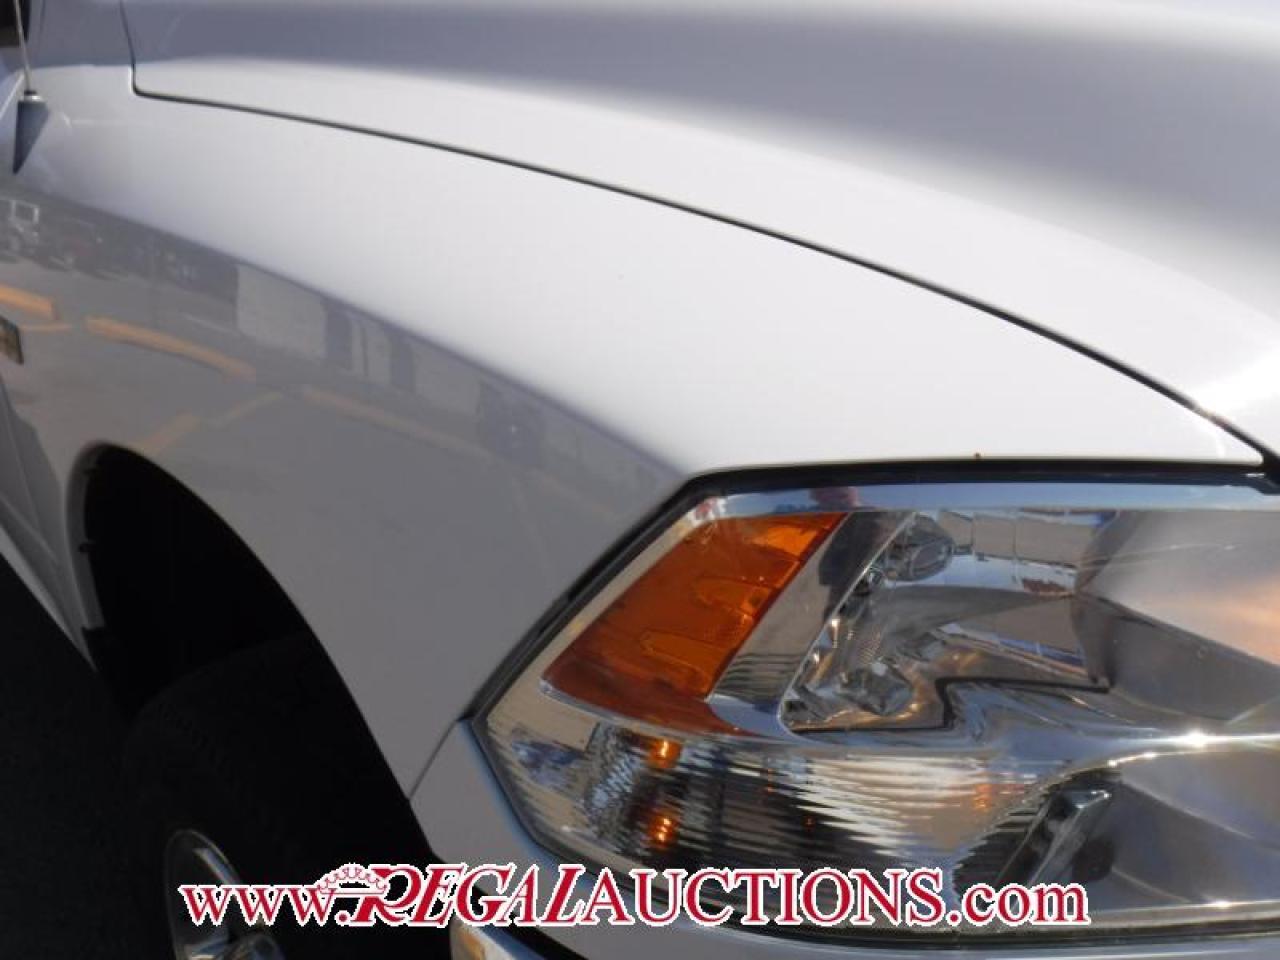 2011 Dodge RAM 2500 SLT CREW CAB LWB 4WD 5.7L